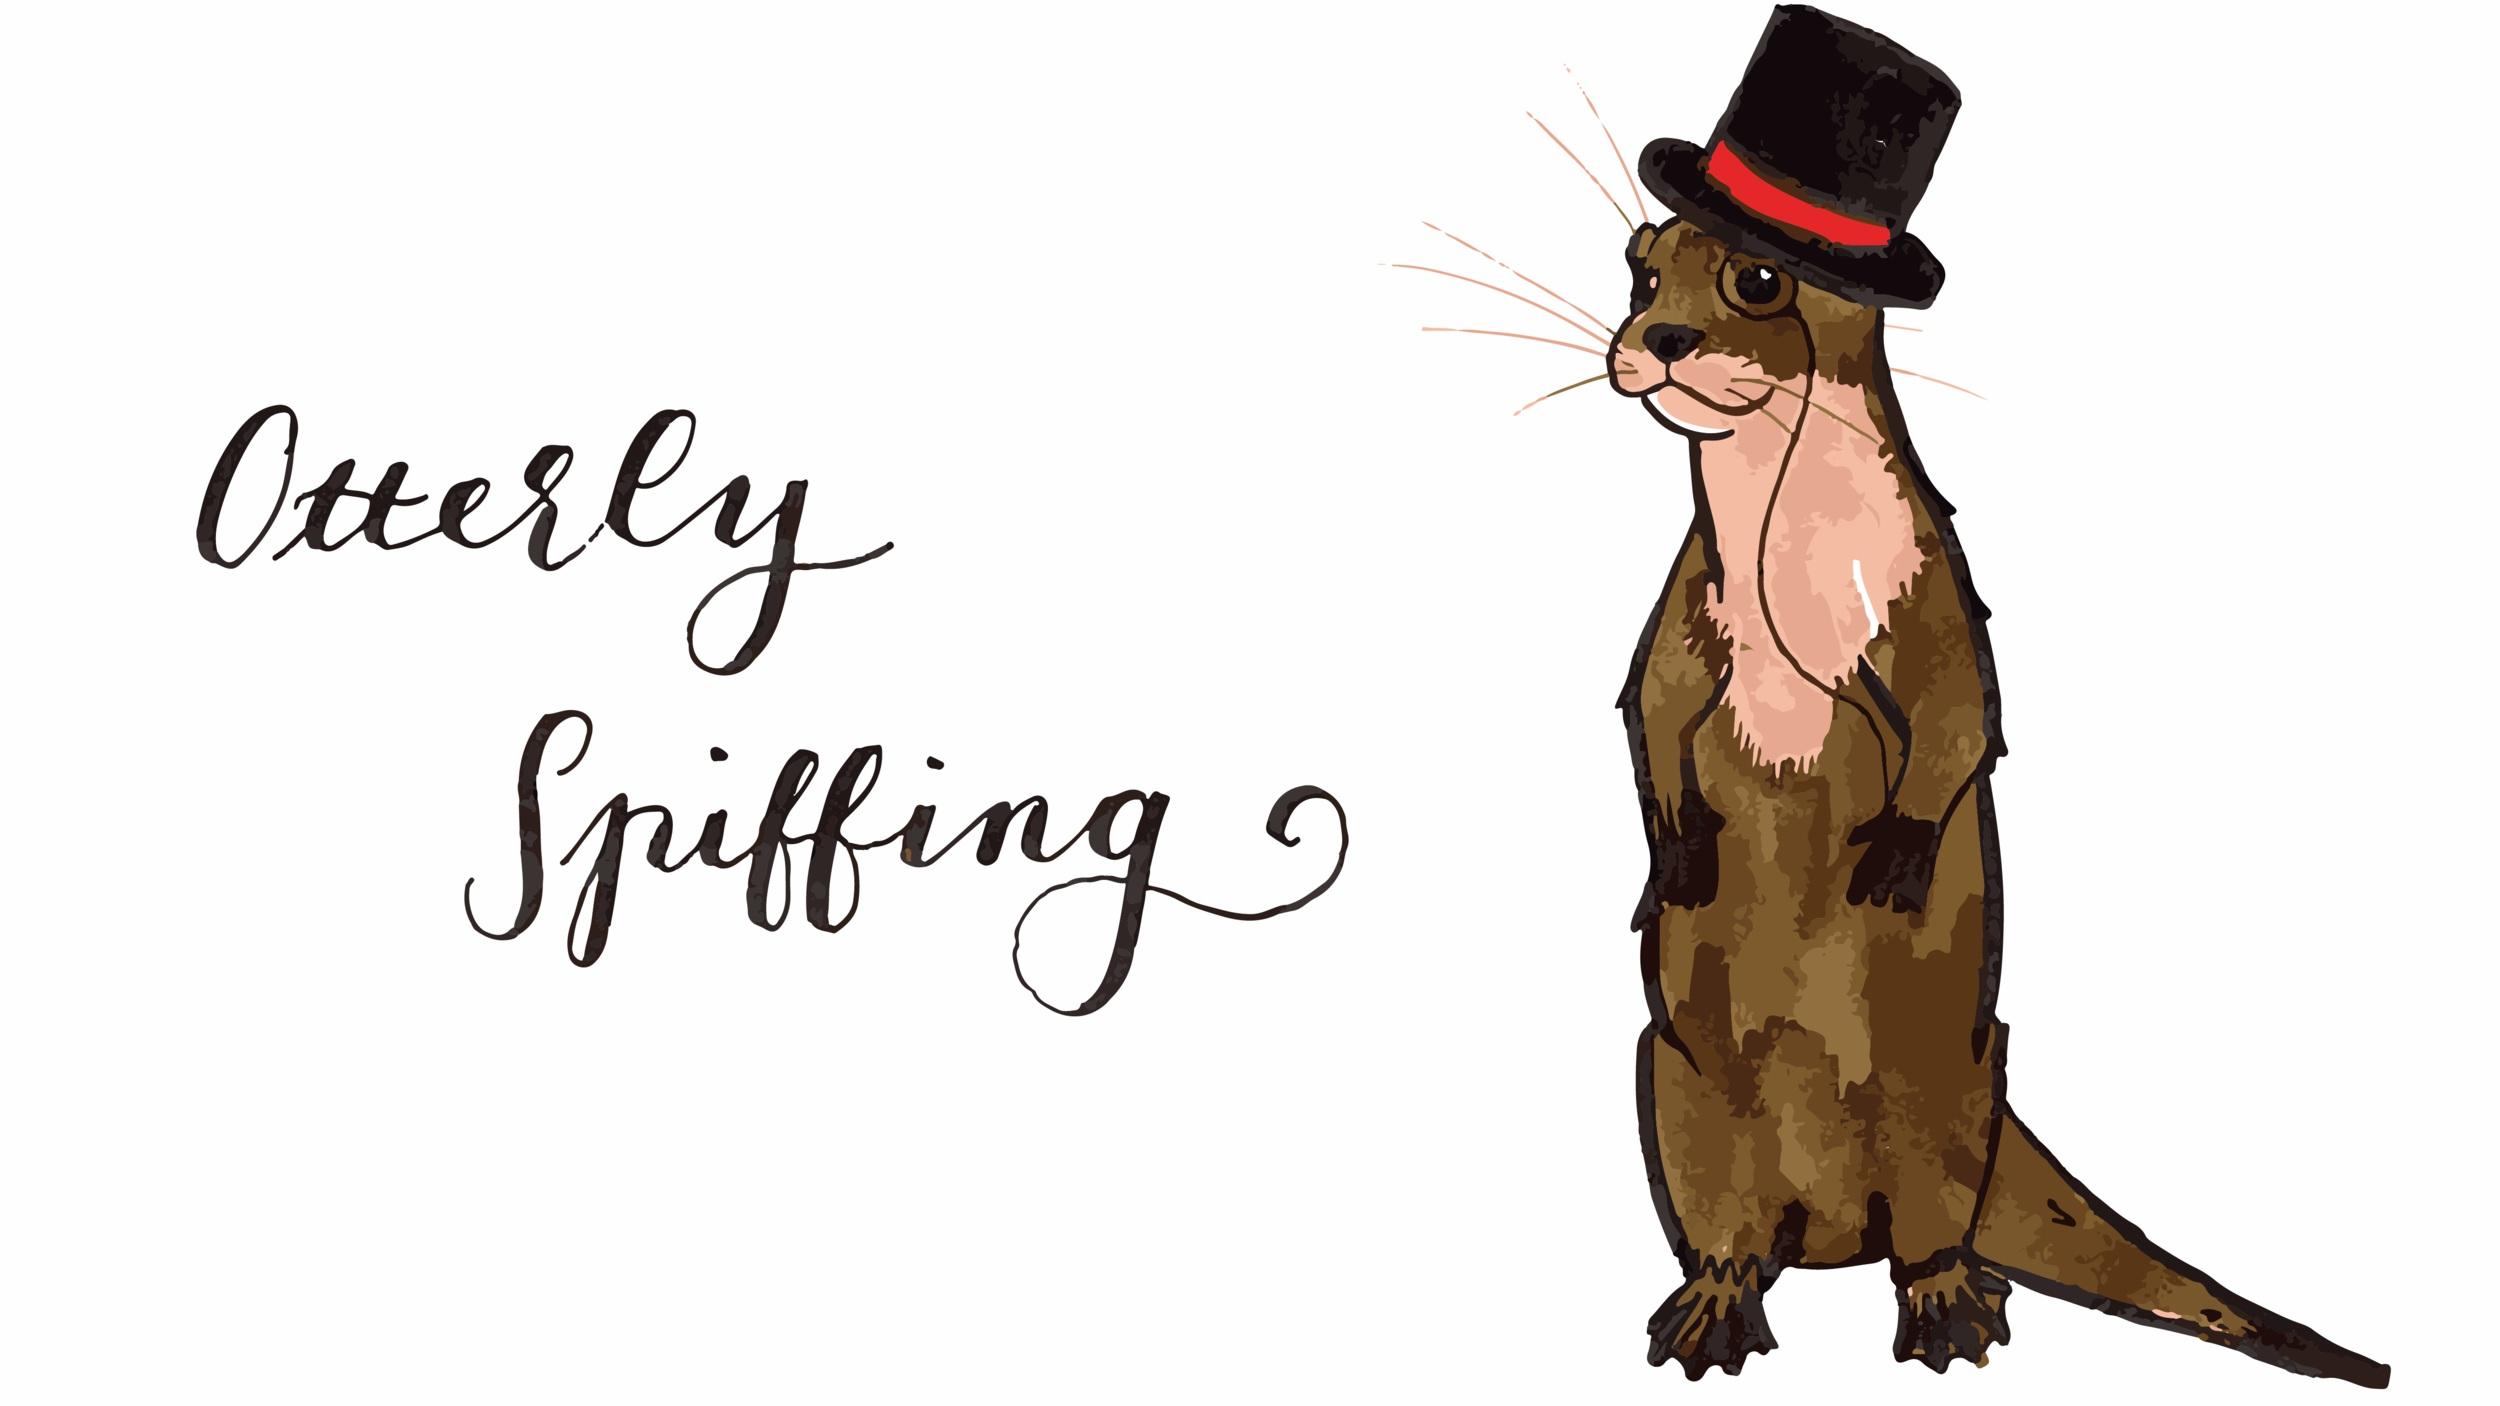 Otterly Spiffing V.png